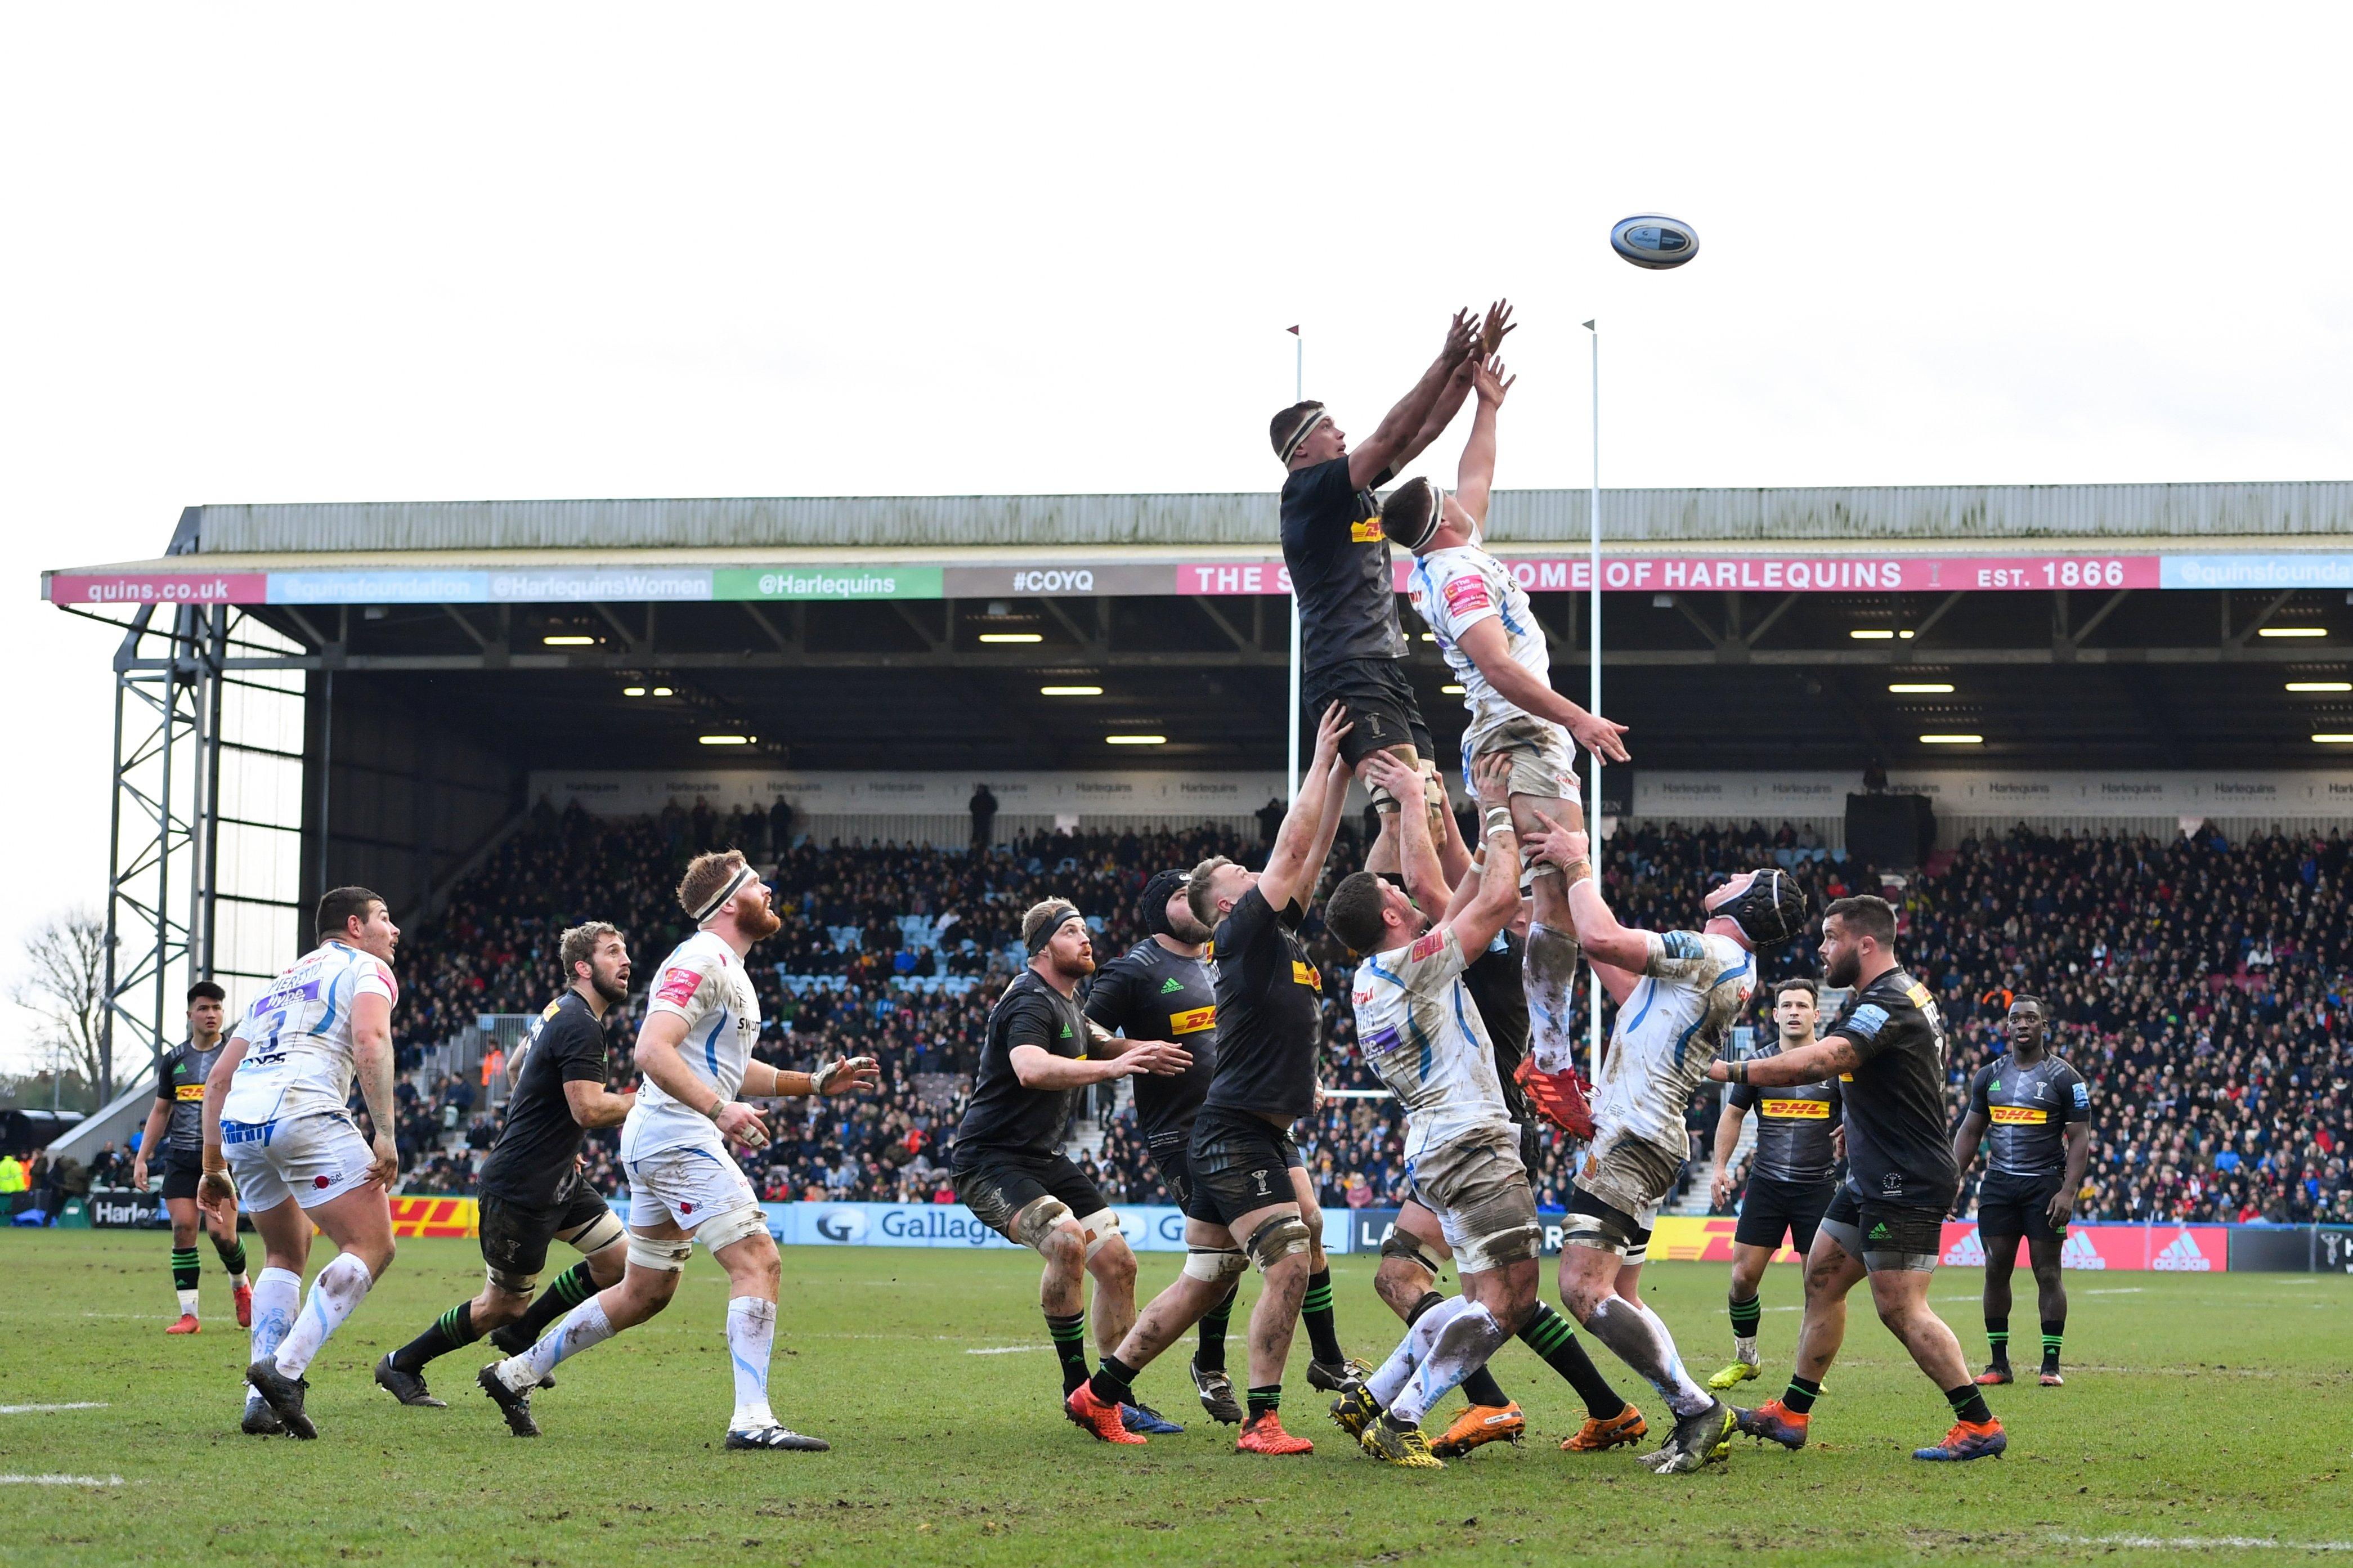 Prem rugby plan to finish season